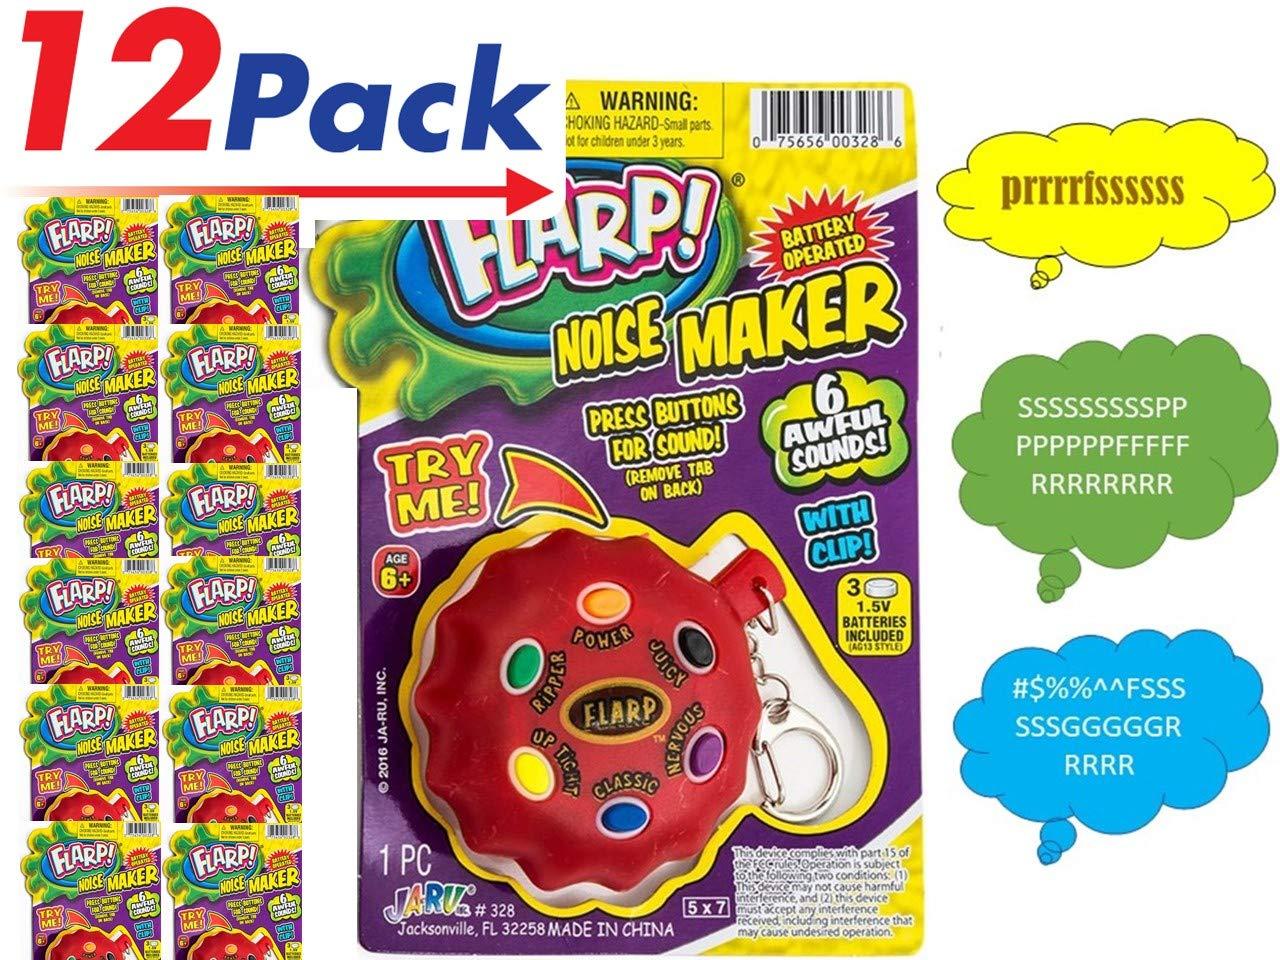 JaRu Flarp Noise Maker (Pack of 12) Prank Your Friends with Fart Noises   Item #328-12